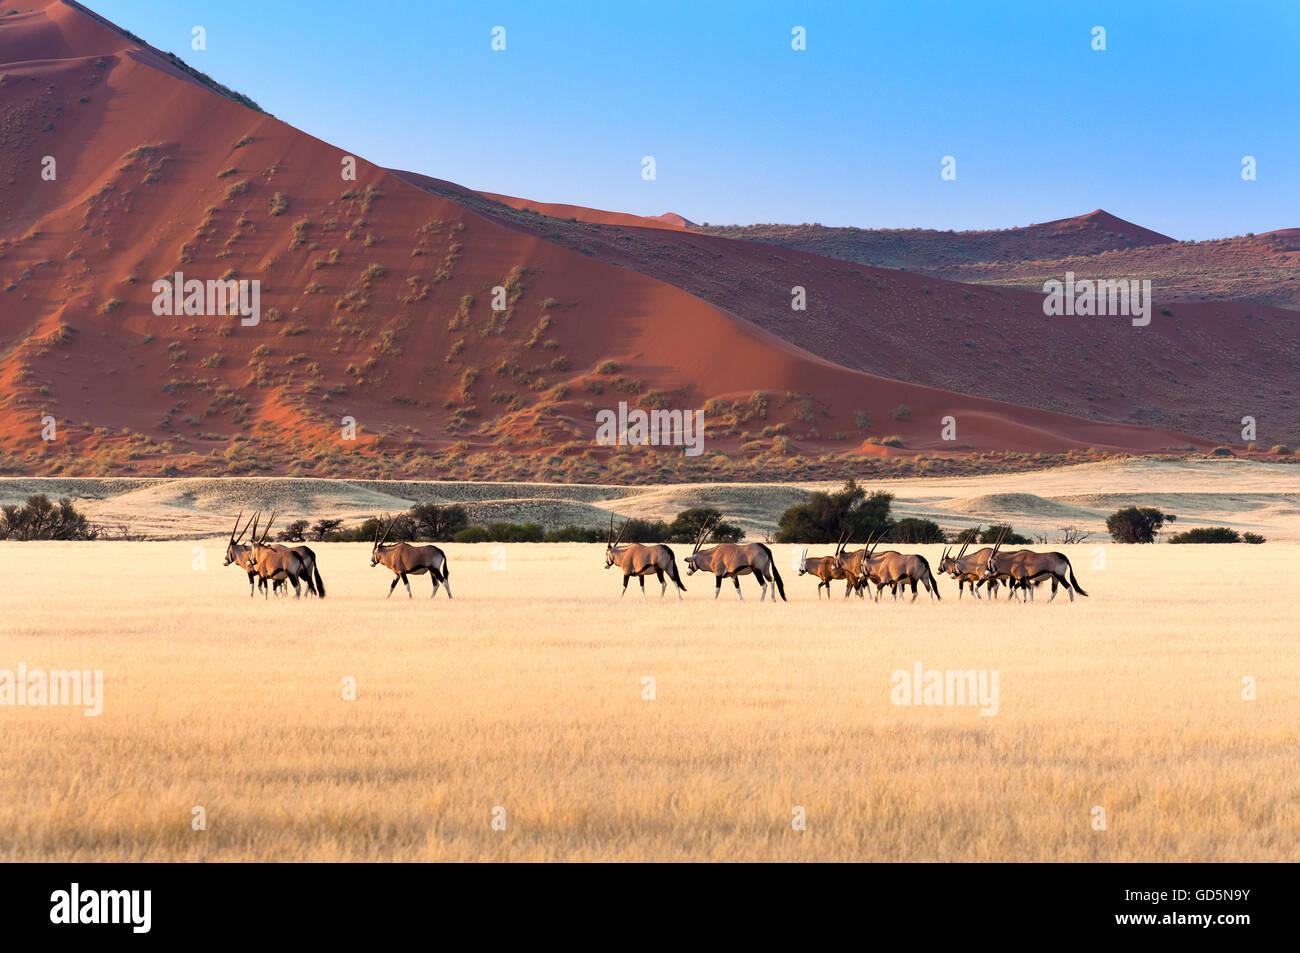 Herde von Gemsbok in Sossusvlei, Namibia Stockbild